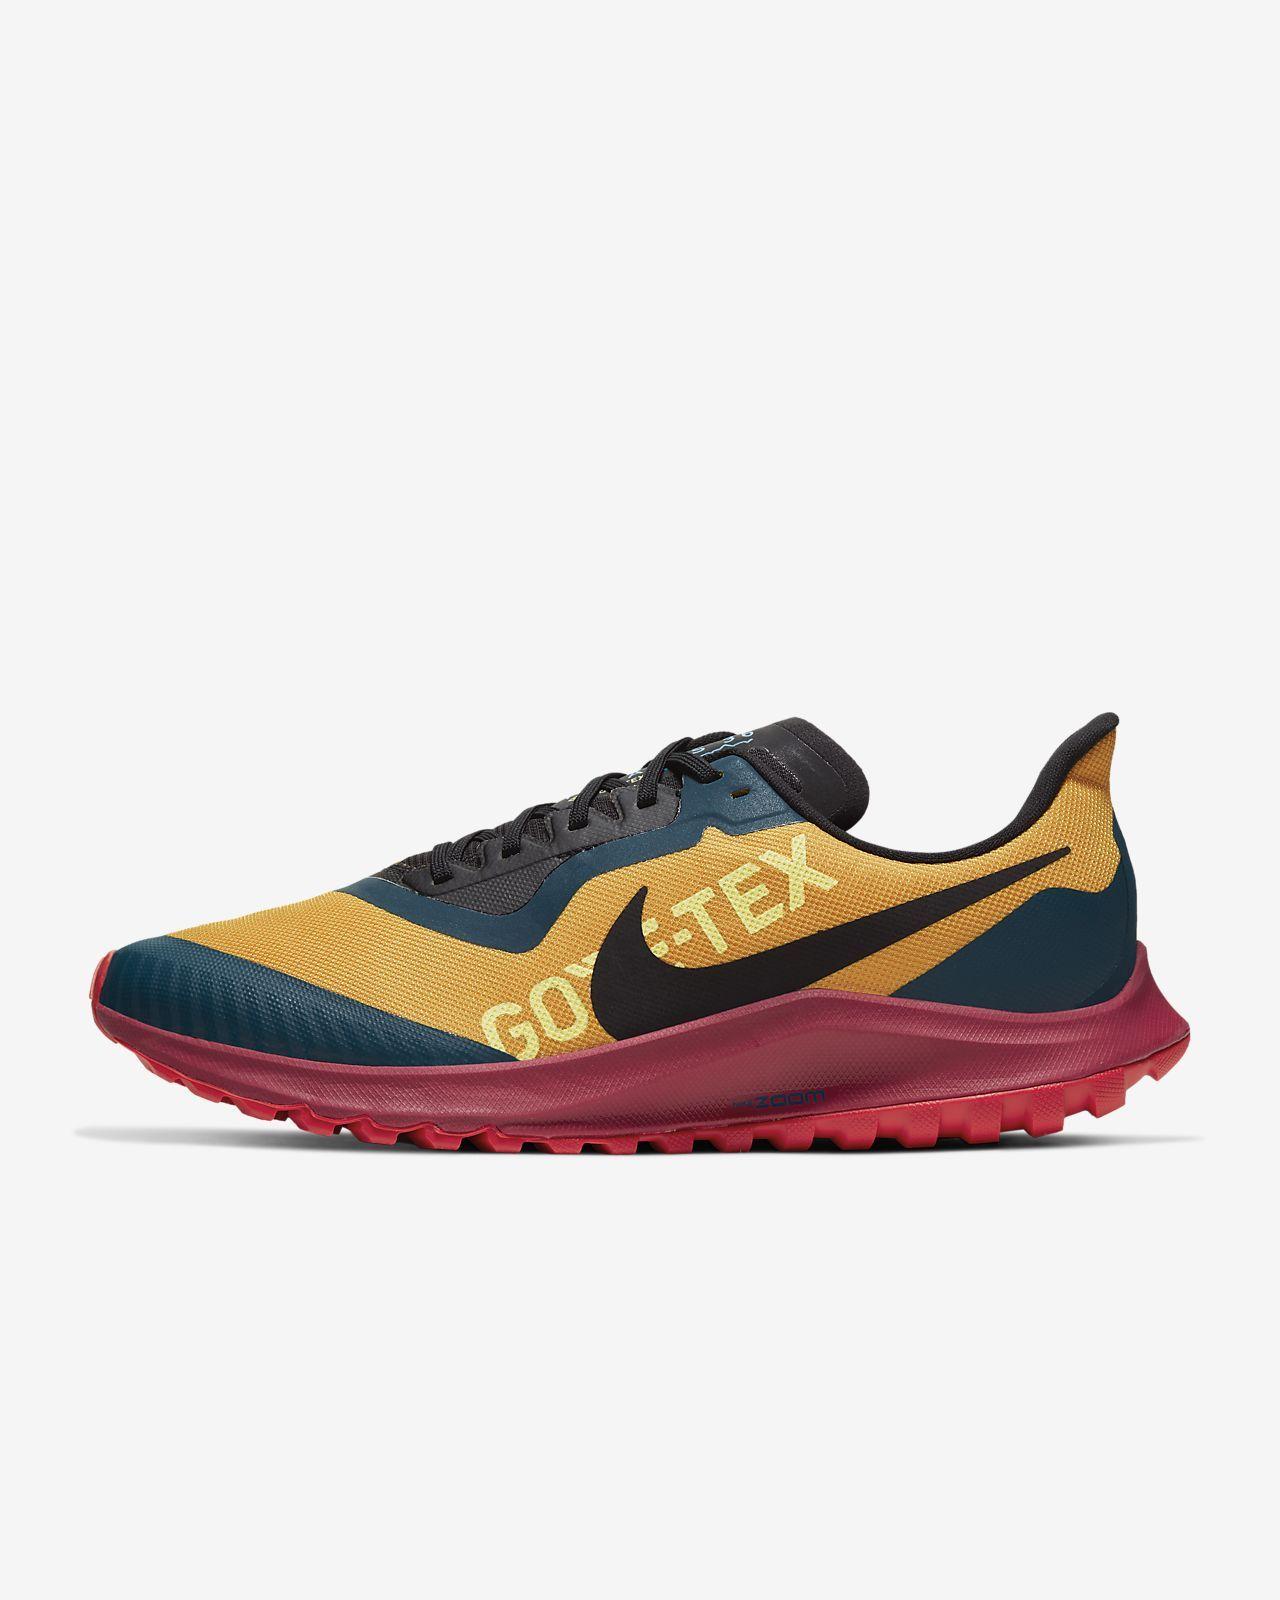 Nike Zoom Pegasus 36 Trail GORE-TEX Men's Trail Running Shoe ...